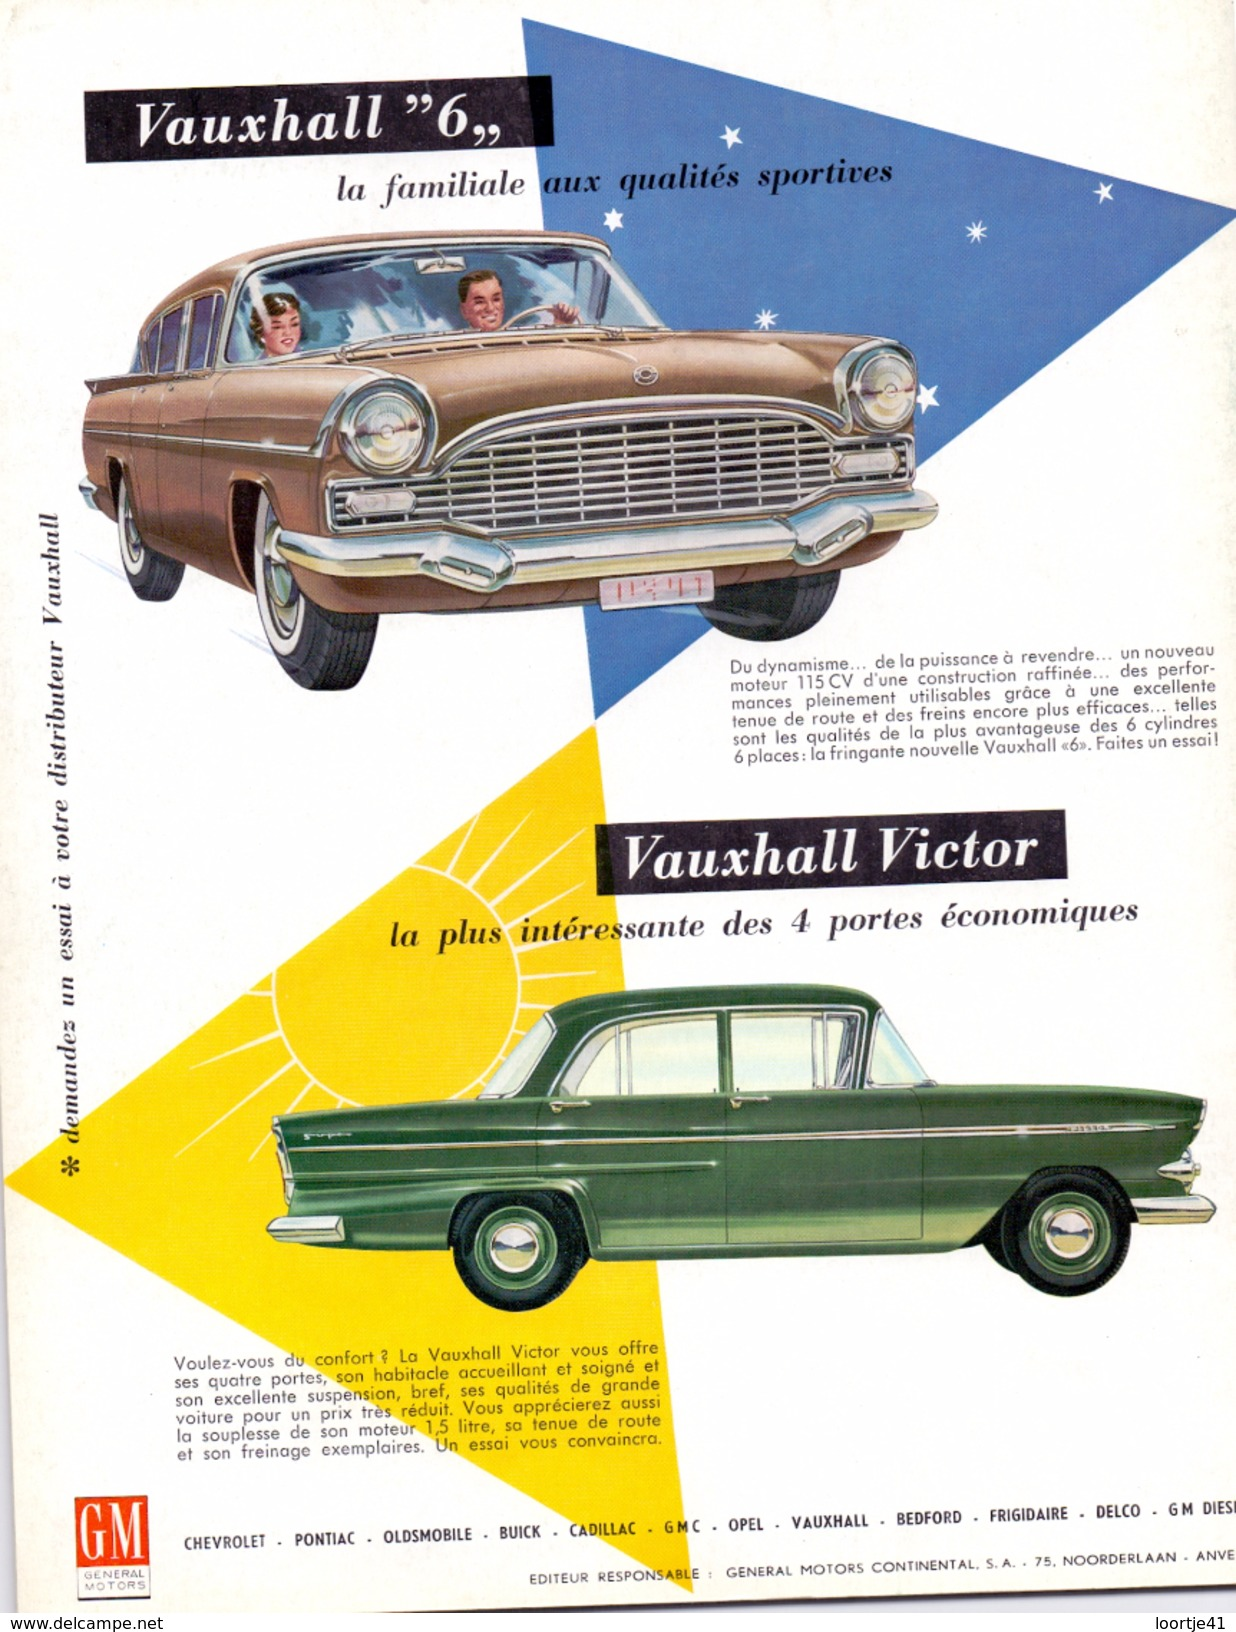 Magazine - Tijdschrift Motorama - General Motors Continental - Pub Reclame GM - Vauxhall - Vauxhall Victor  1 / 1961 - Auto